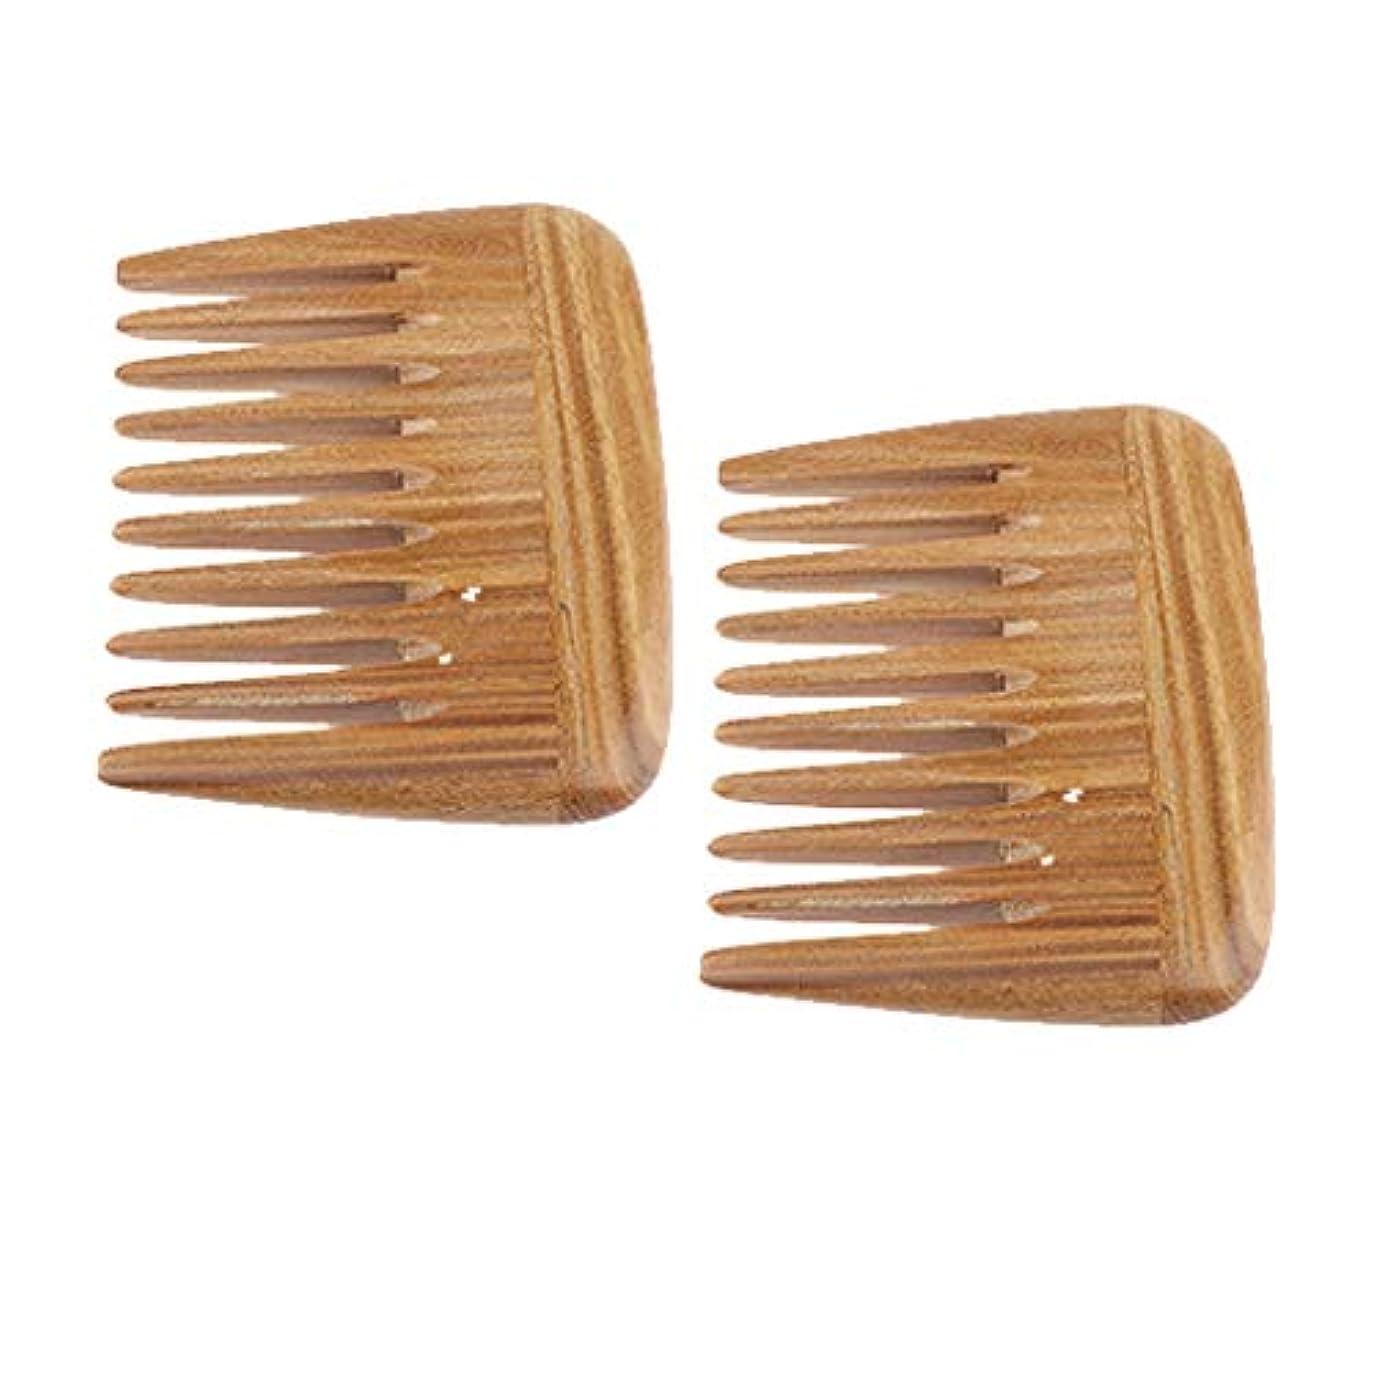 B Baosity 2個 静電気防止櫛 ポケット 広い歯 ヘアコーム 木製櫛 プレゼント